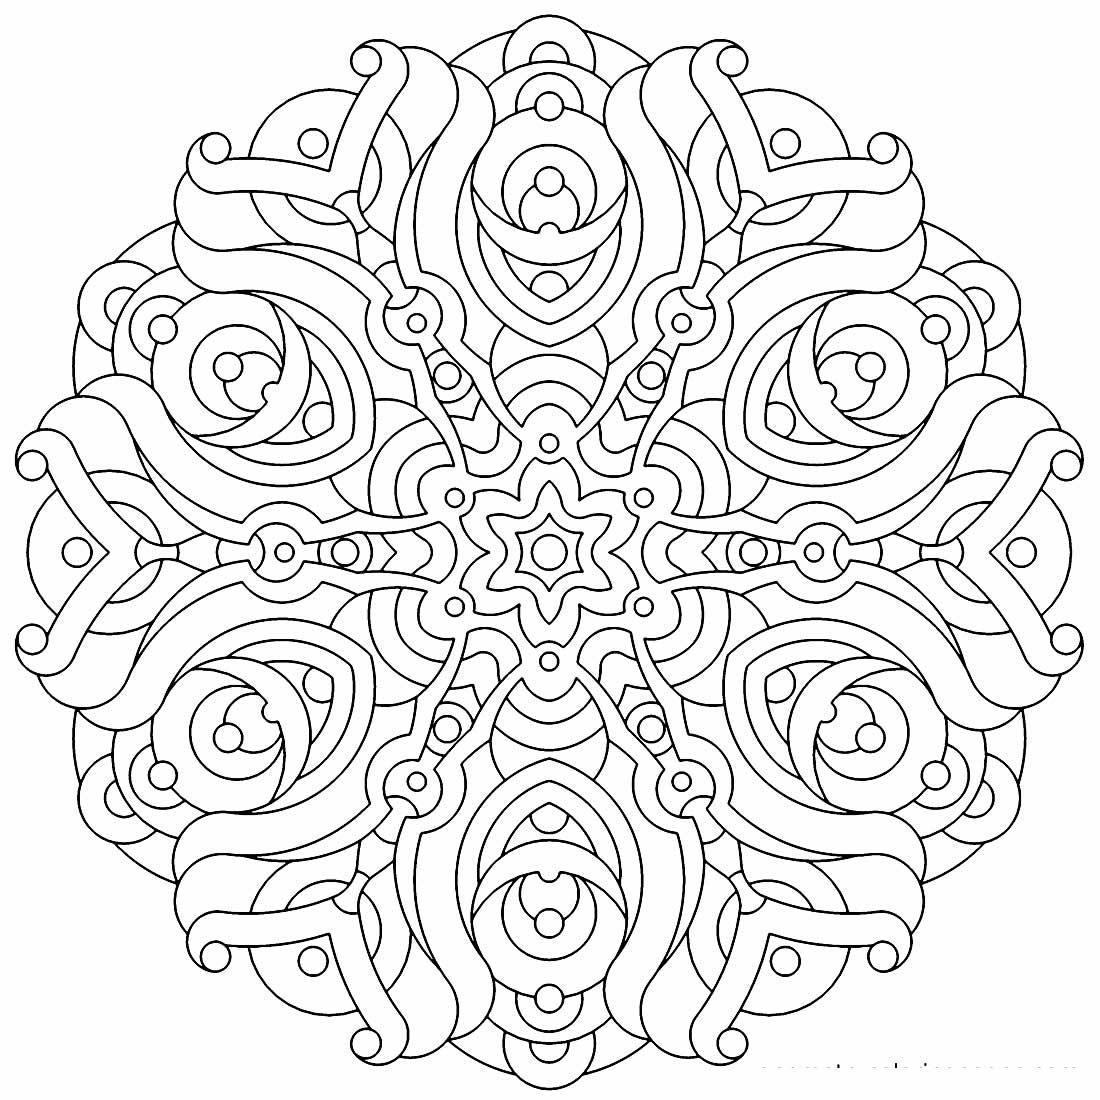 Desenho geométrico para pintar